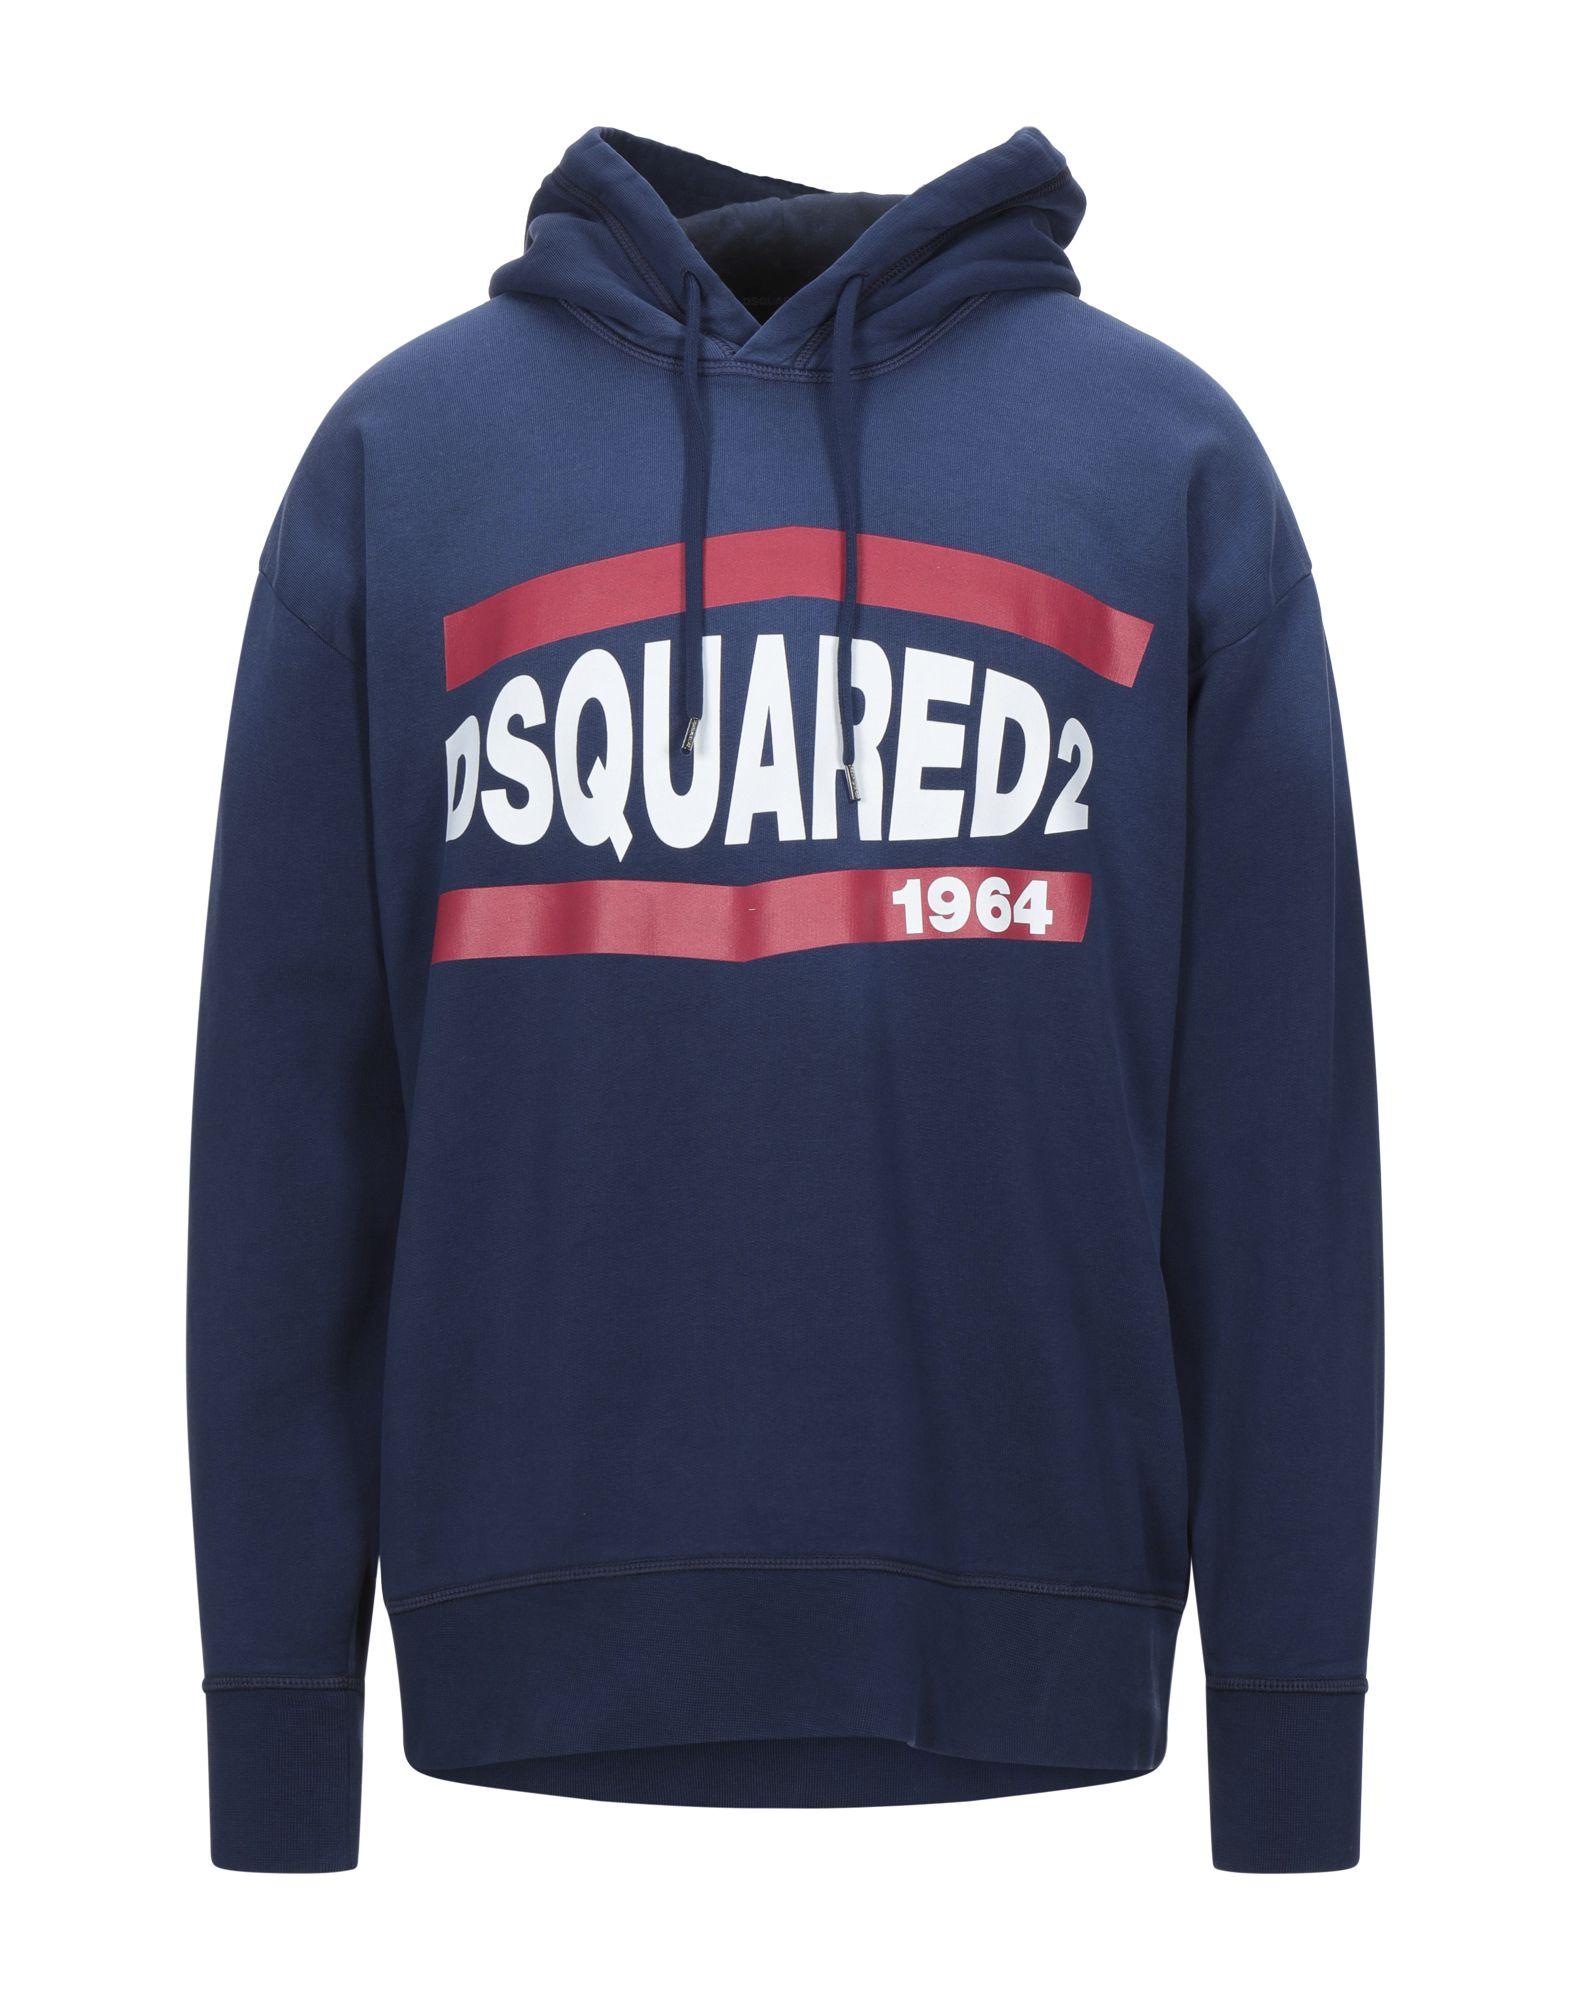 DSQUARED2 Sweatshirts. sweatshirt fleece, print, logo, faded, solid color, hooded collar, long sleeves, drawstring closure, no pockets, fleece lining. 100% Cotton, Elastane